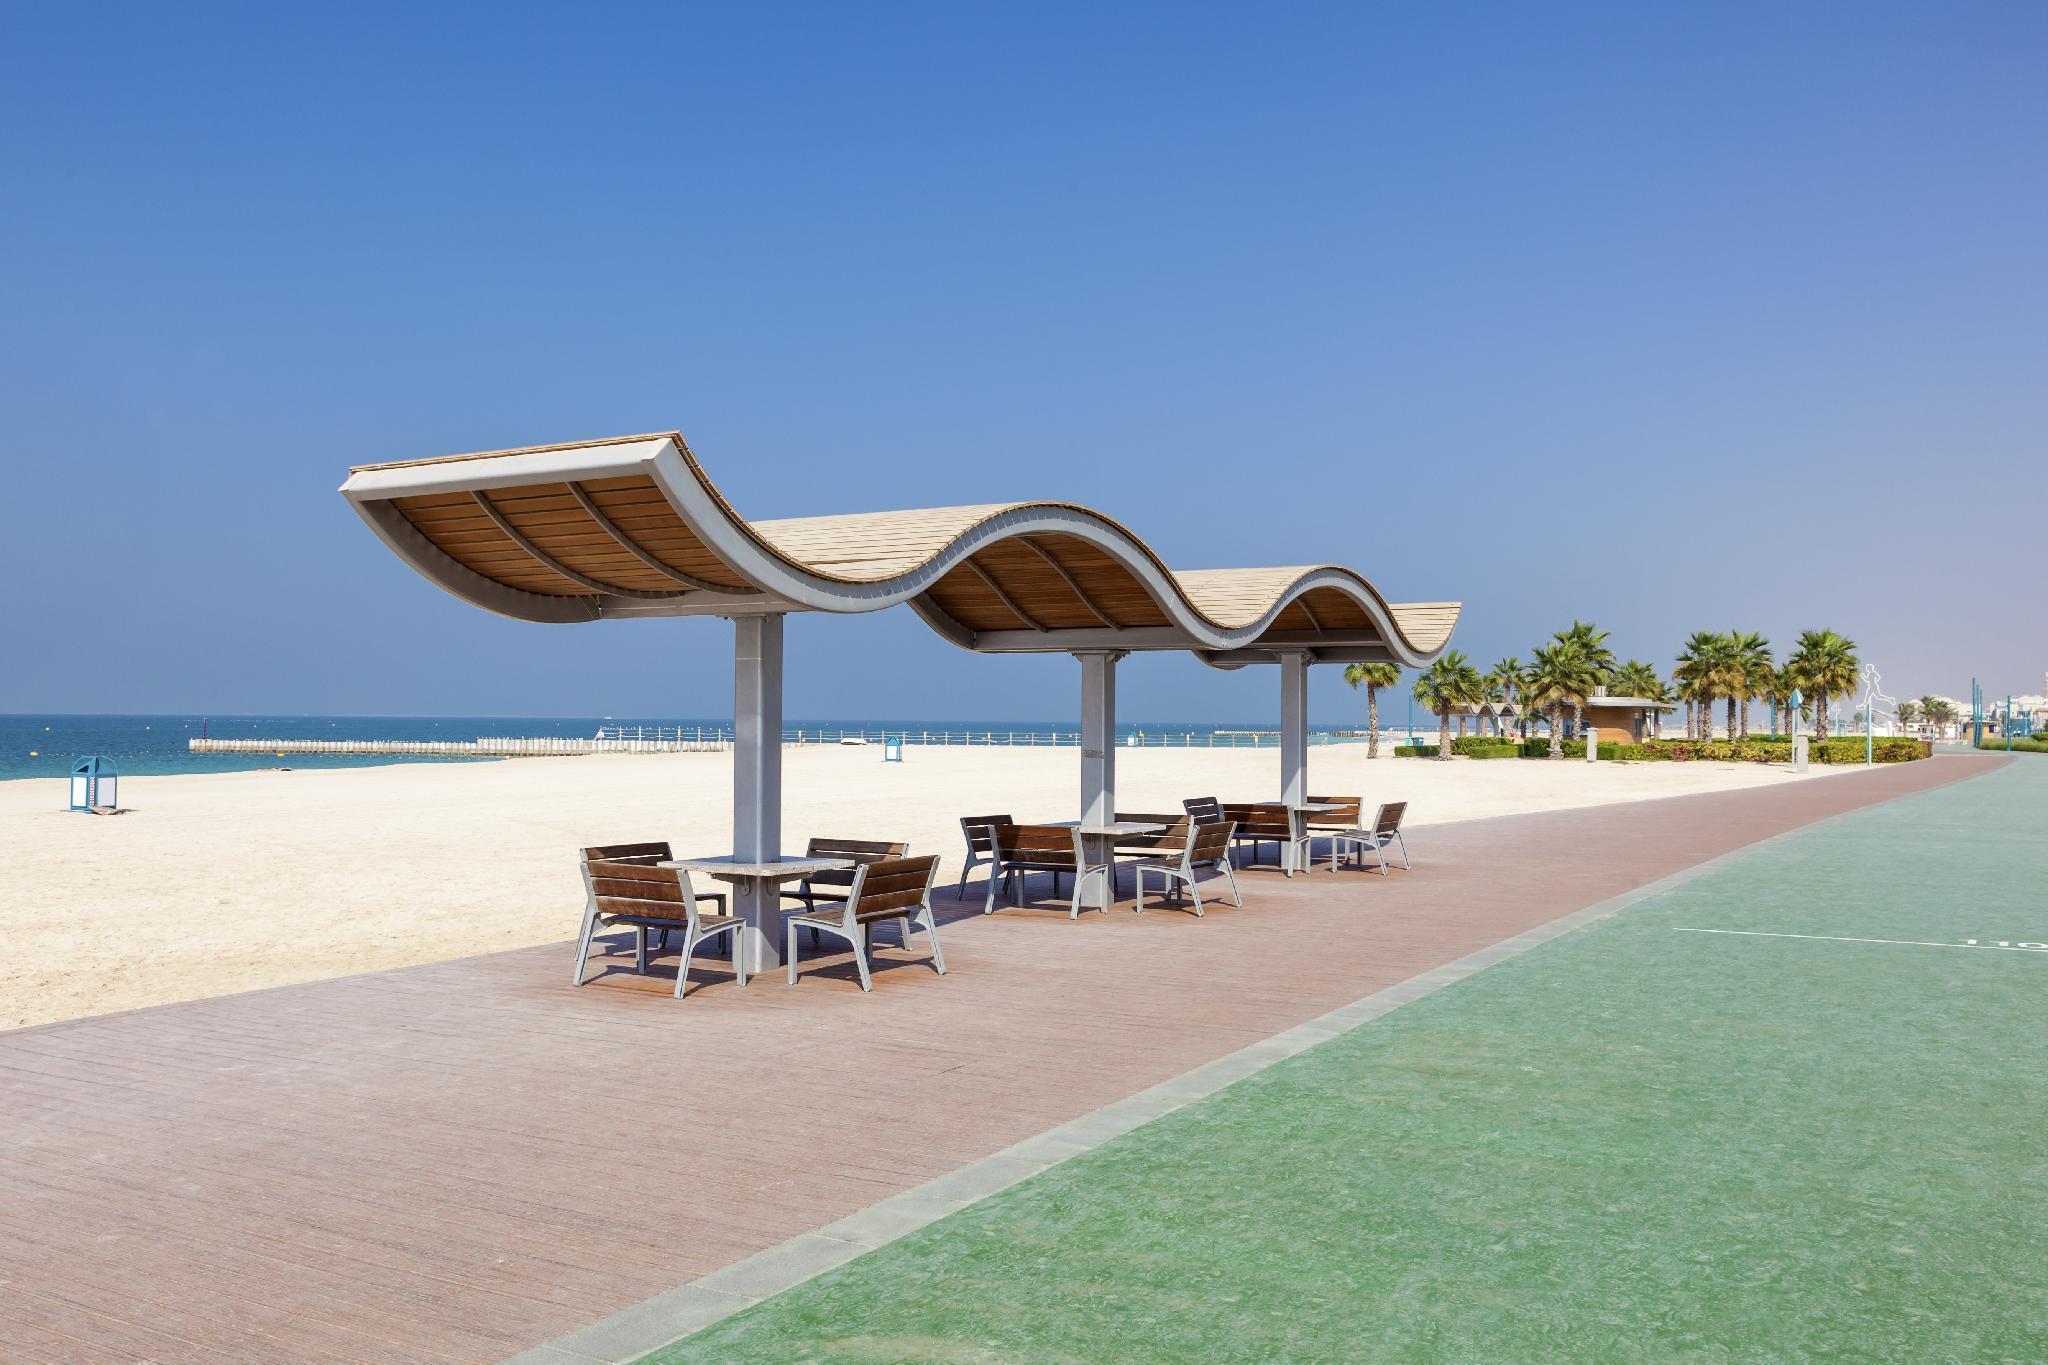 4 bedroom duplex suite Palm Jumeirah - 5 star